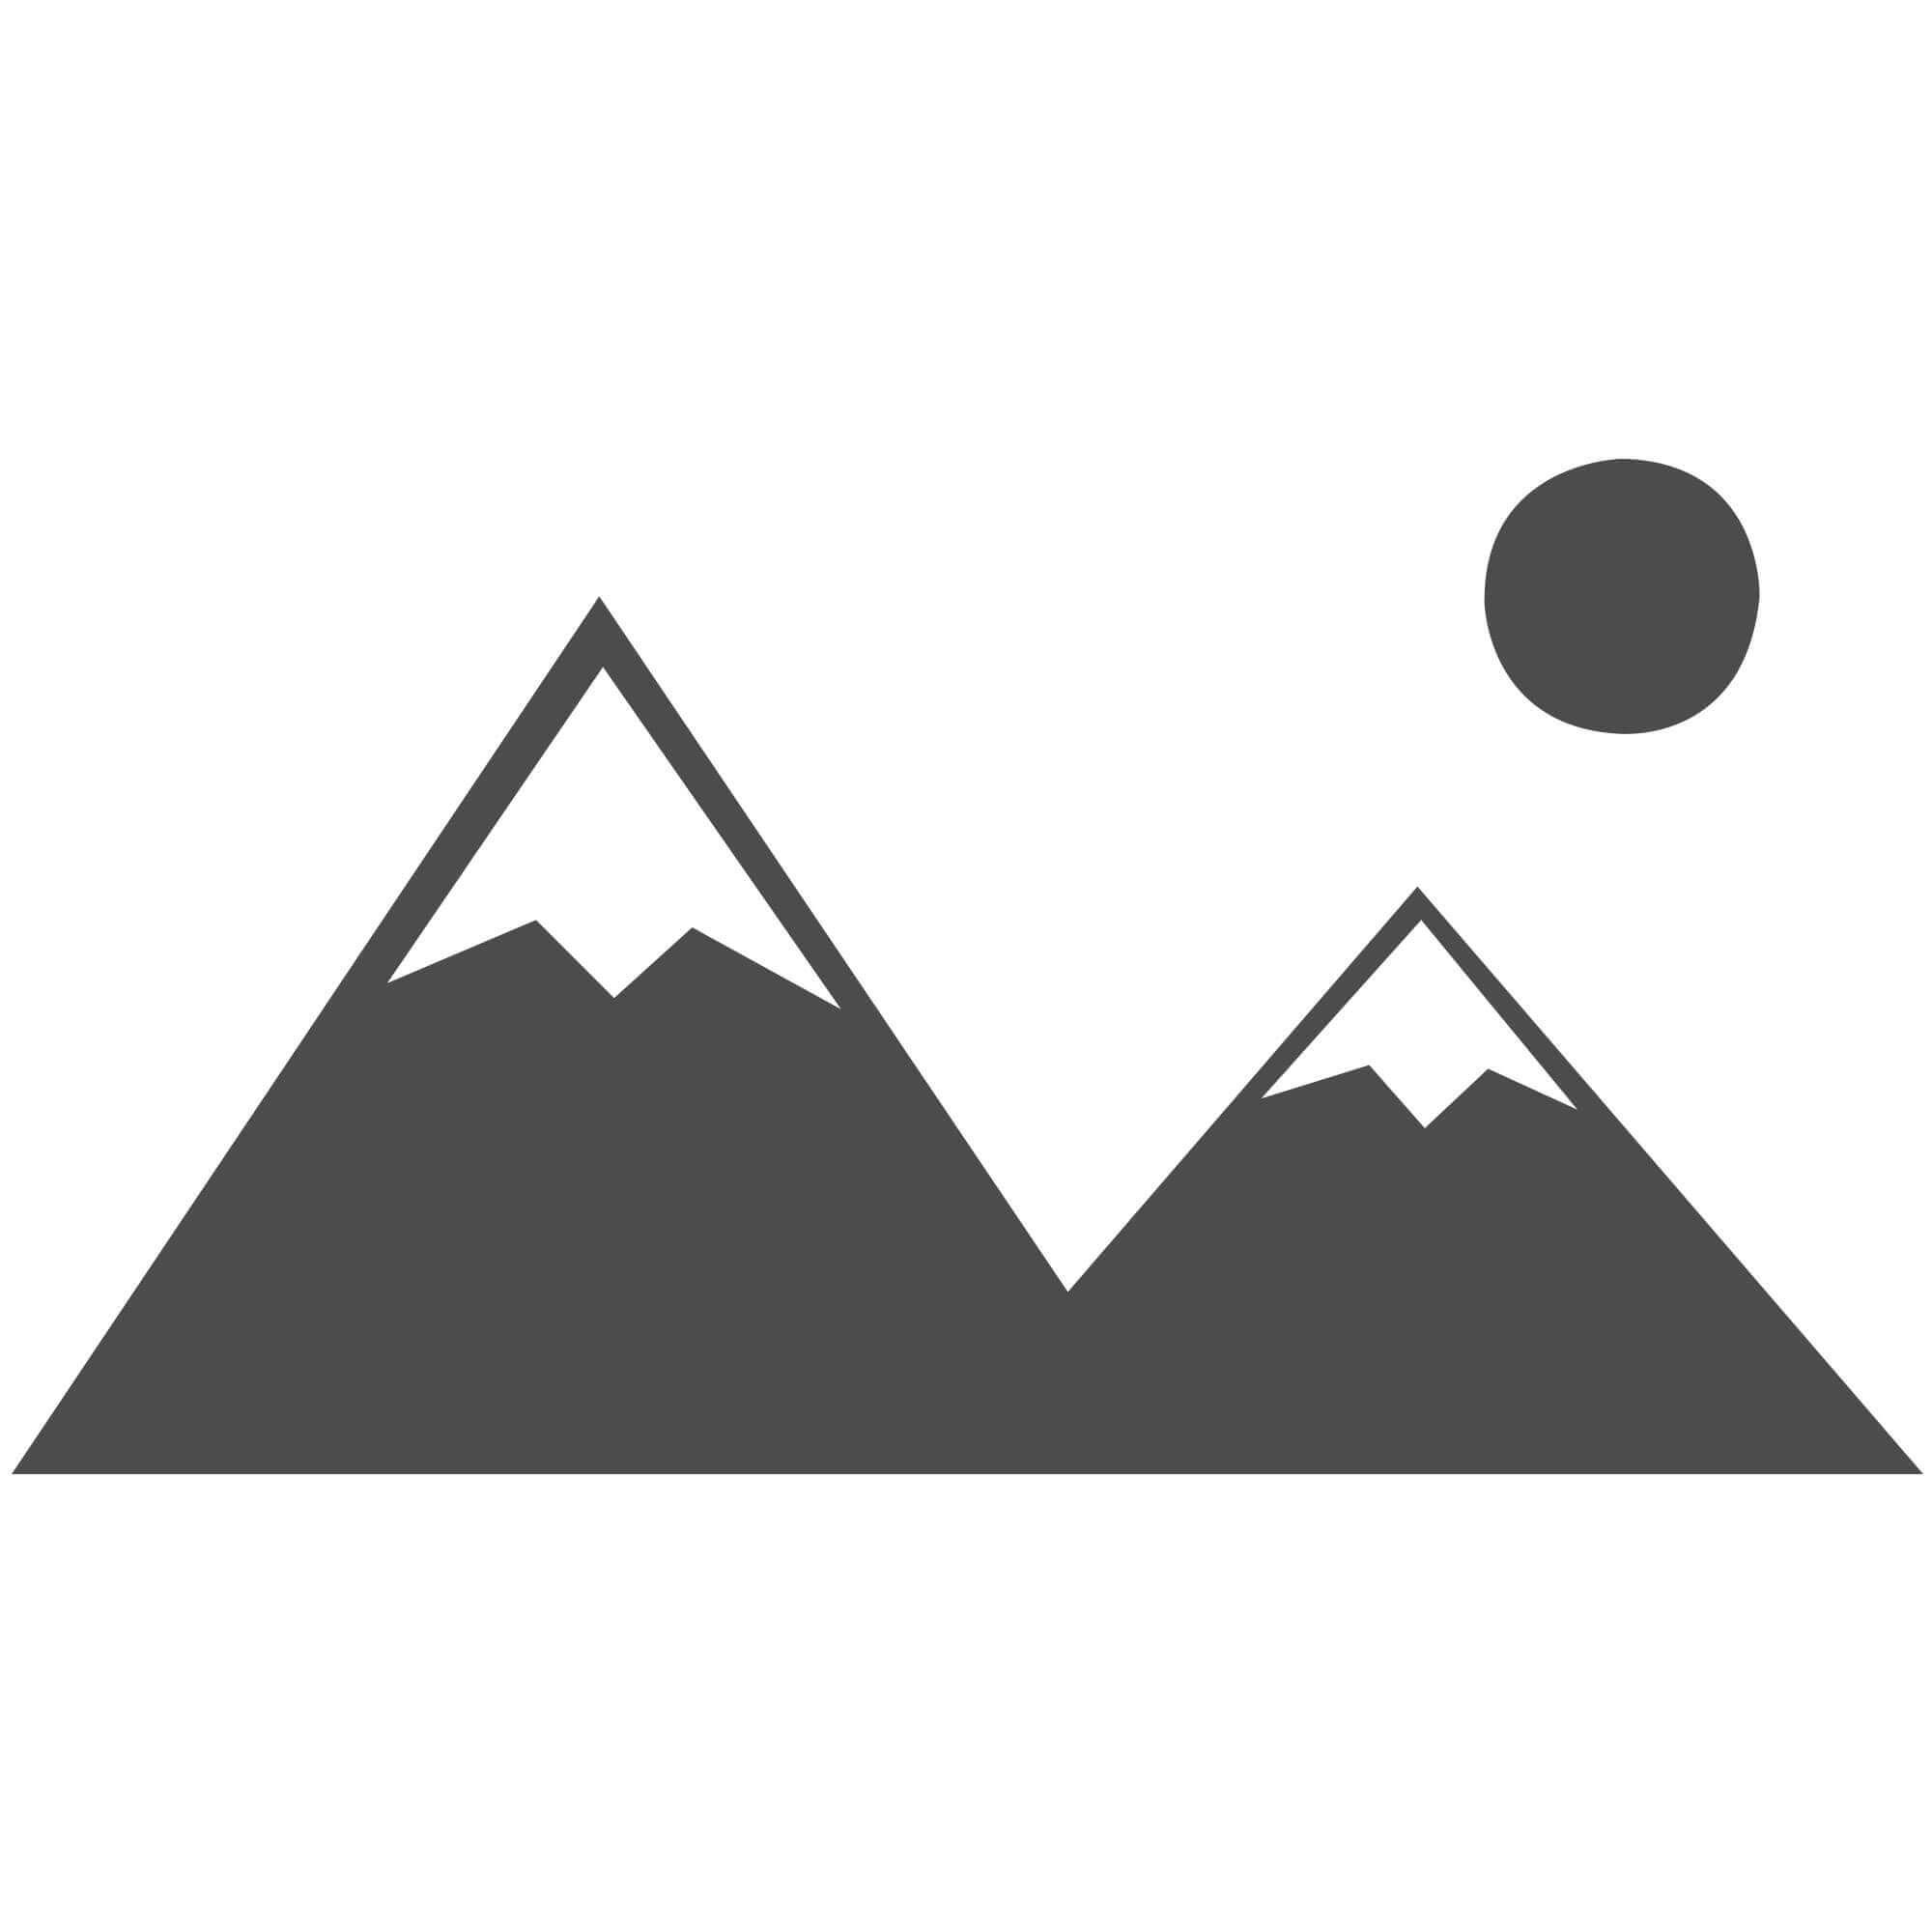 Griot Stripe Rug - Erikundi - KI806 Masala